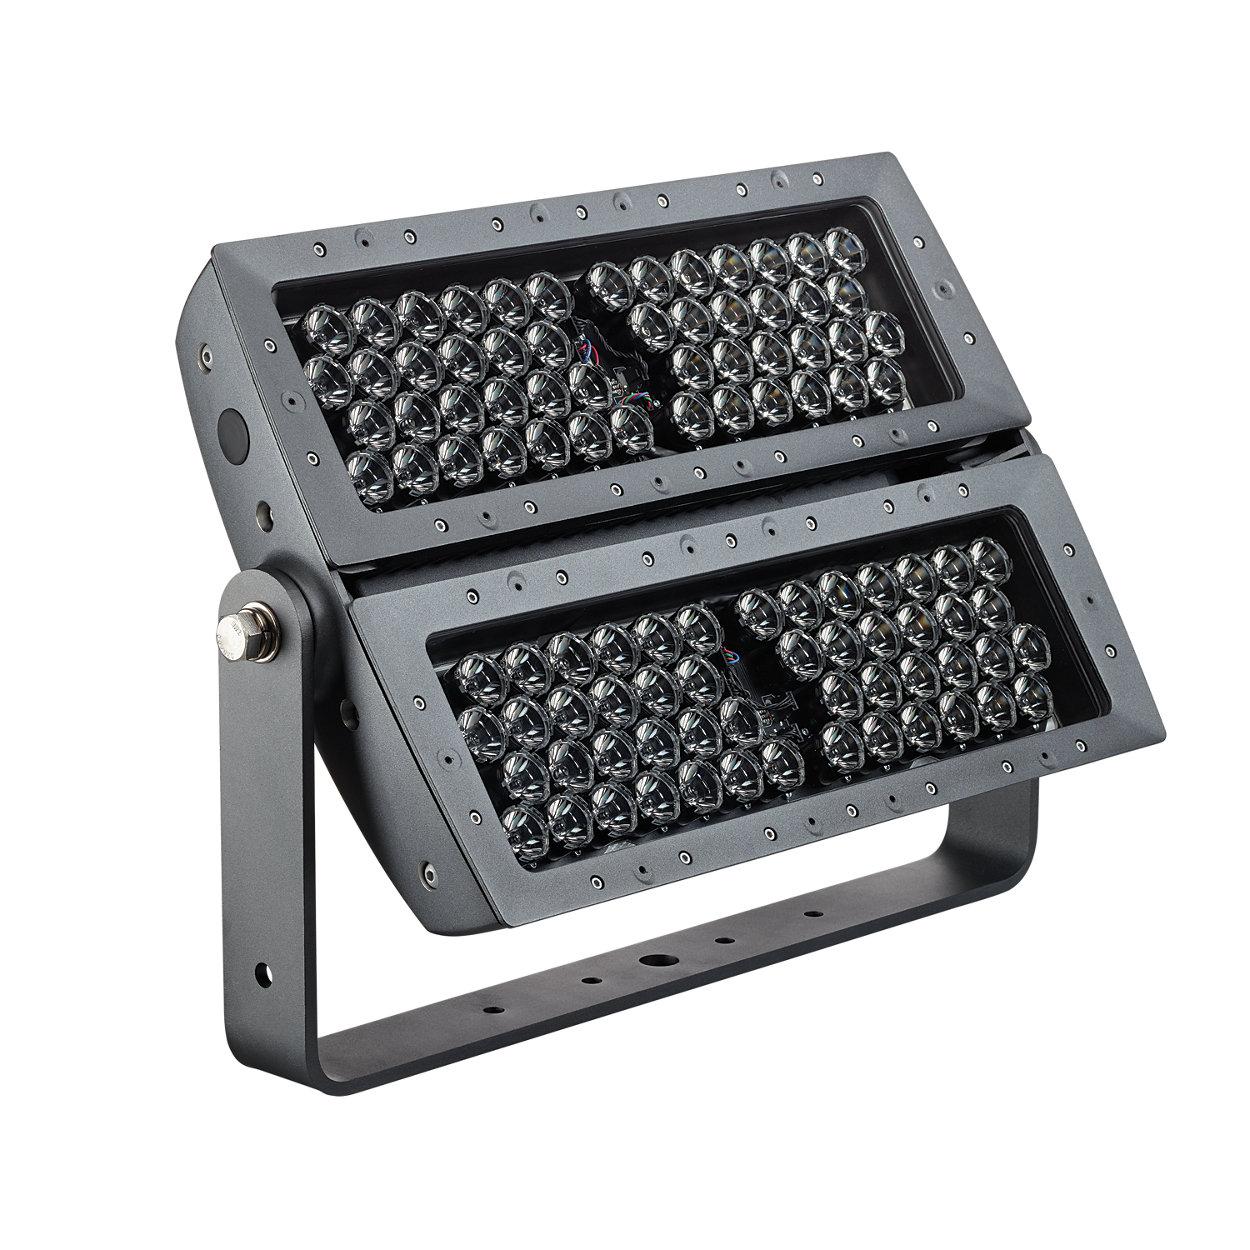 Exterior long-throw floodlight with intelligent RGB light